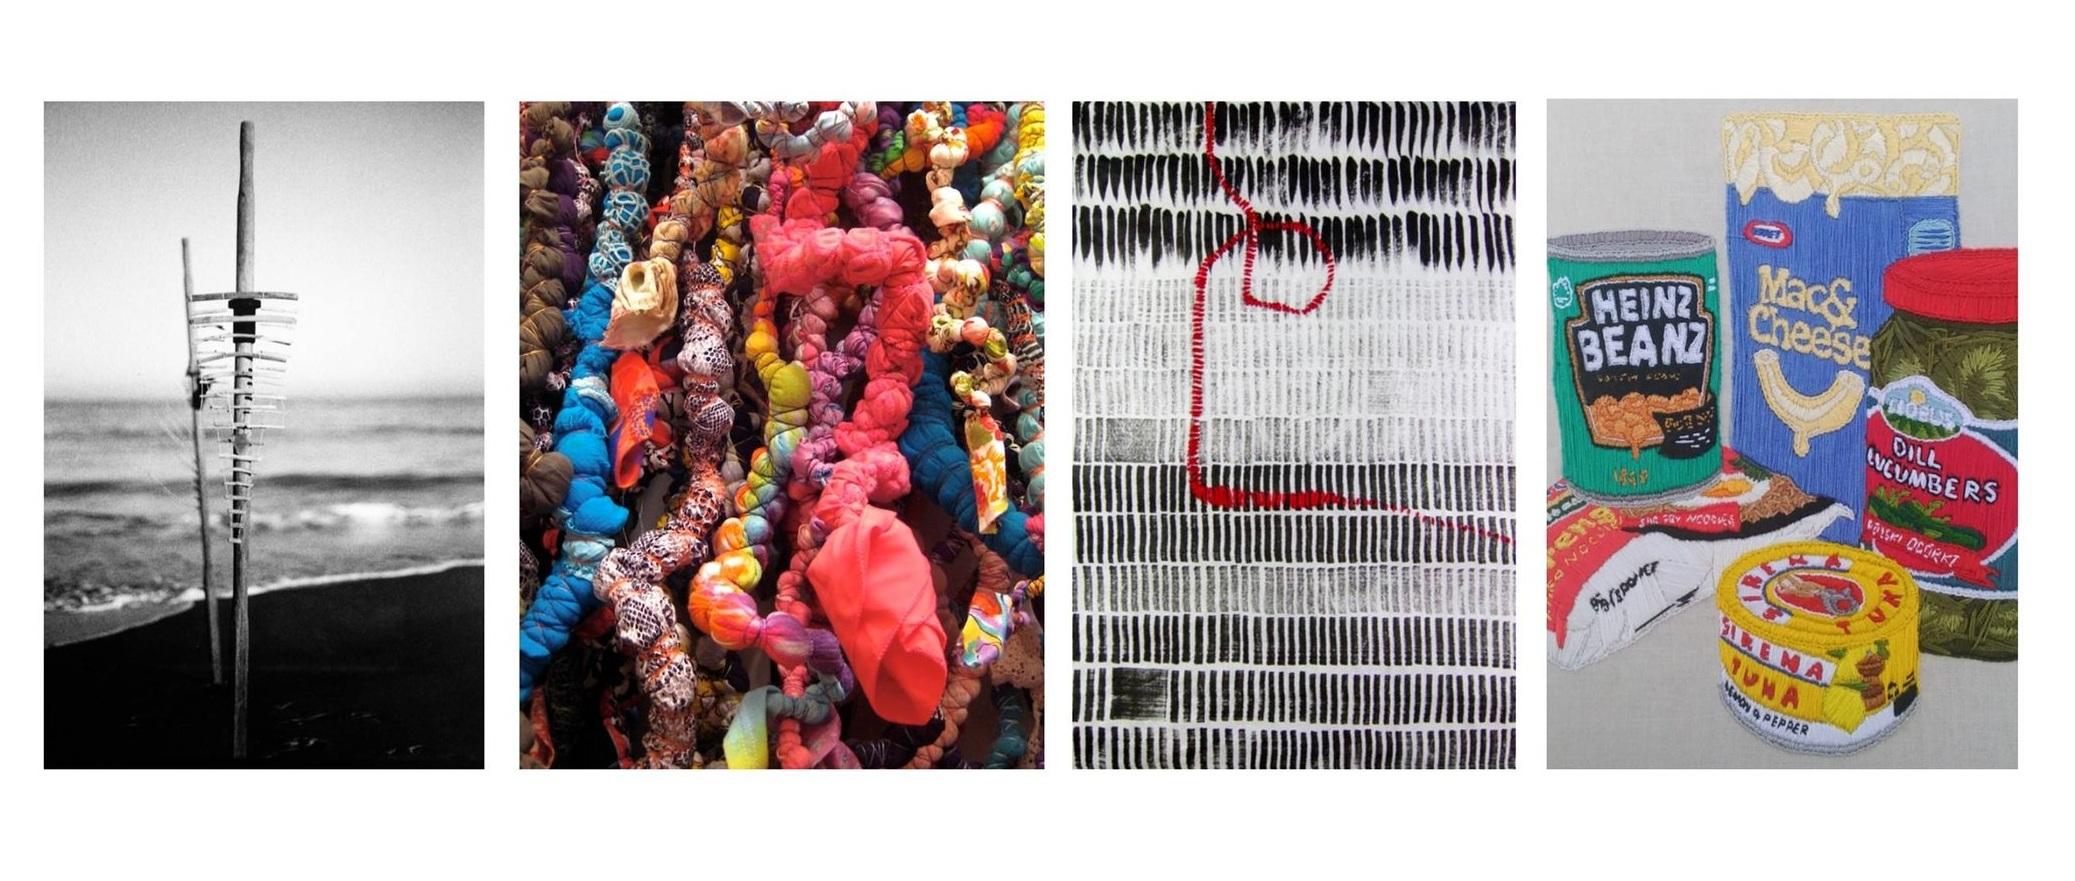 Artworks by (L to R): Jody Loaring, Tomoko Yamada, Jacky Cheng & Regi Cherini